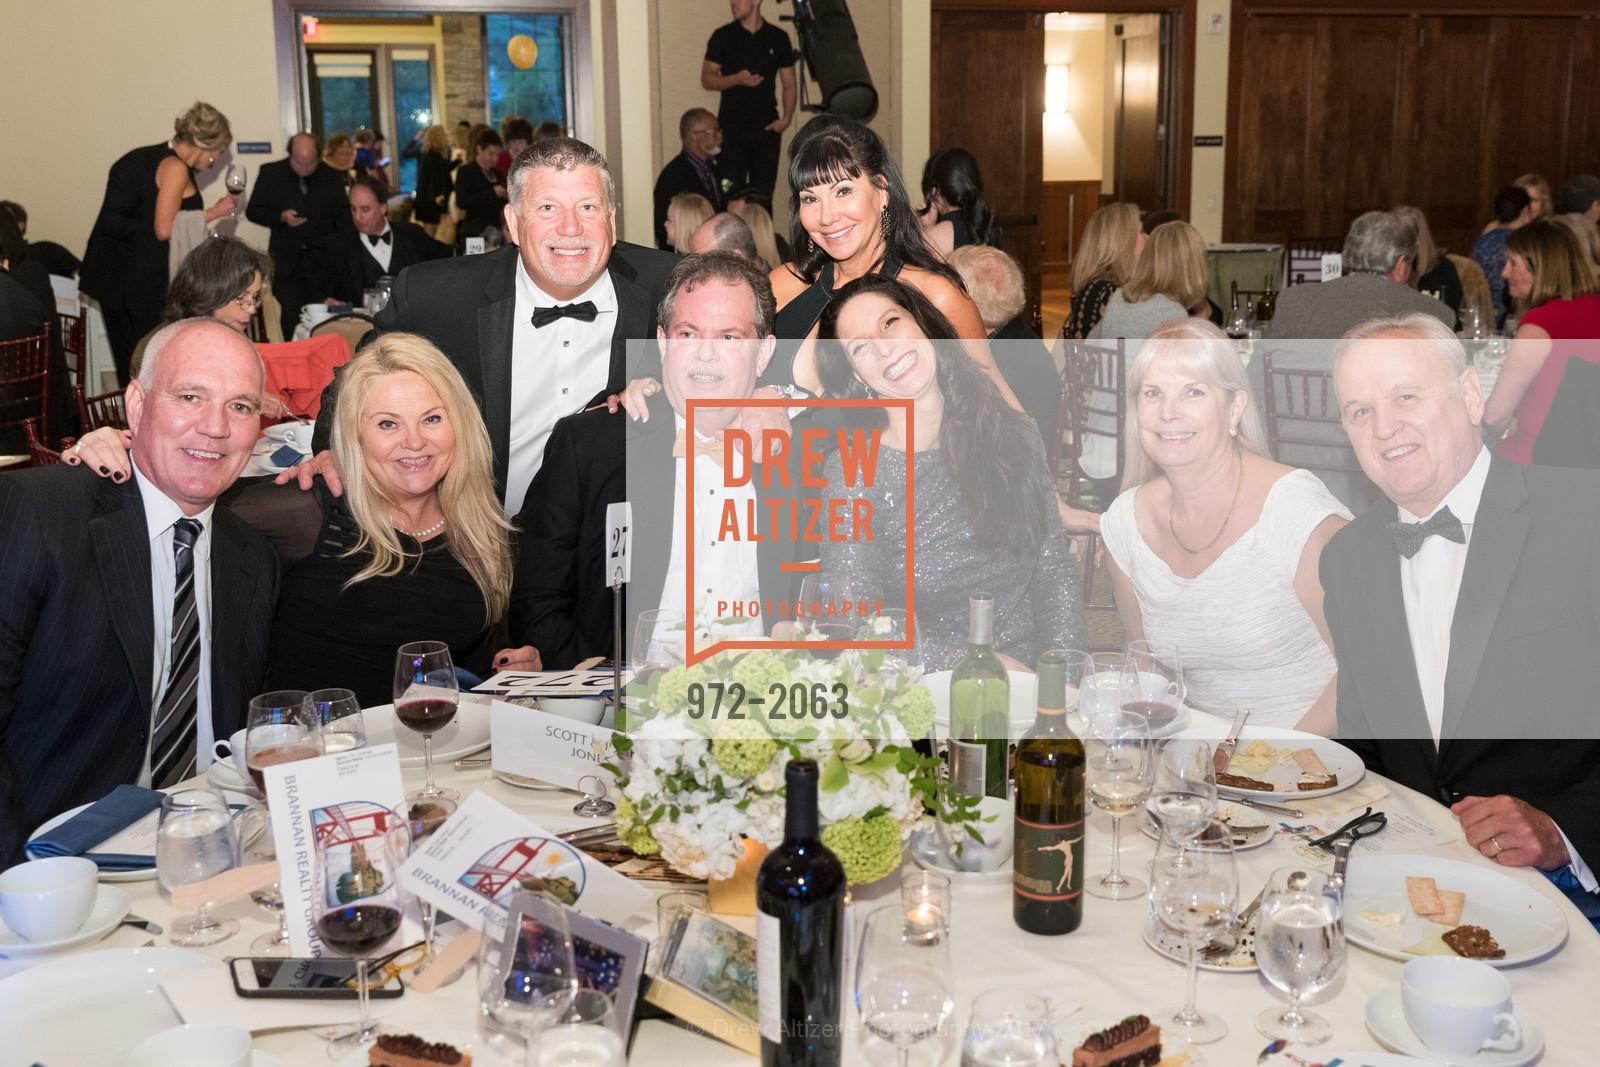 Tim Coleman, Carina Coleman, Tom Timmer, Maria Chapman, Scott Jones, Julie Jones, Marty Roach, Jim Roach, Great Chefs and Wineries, Peacock Gap, April 22nd, 2017